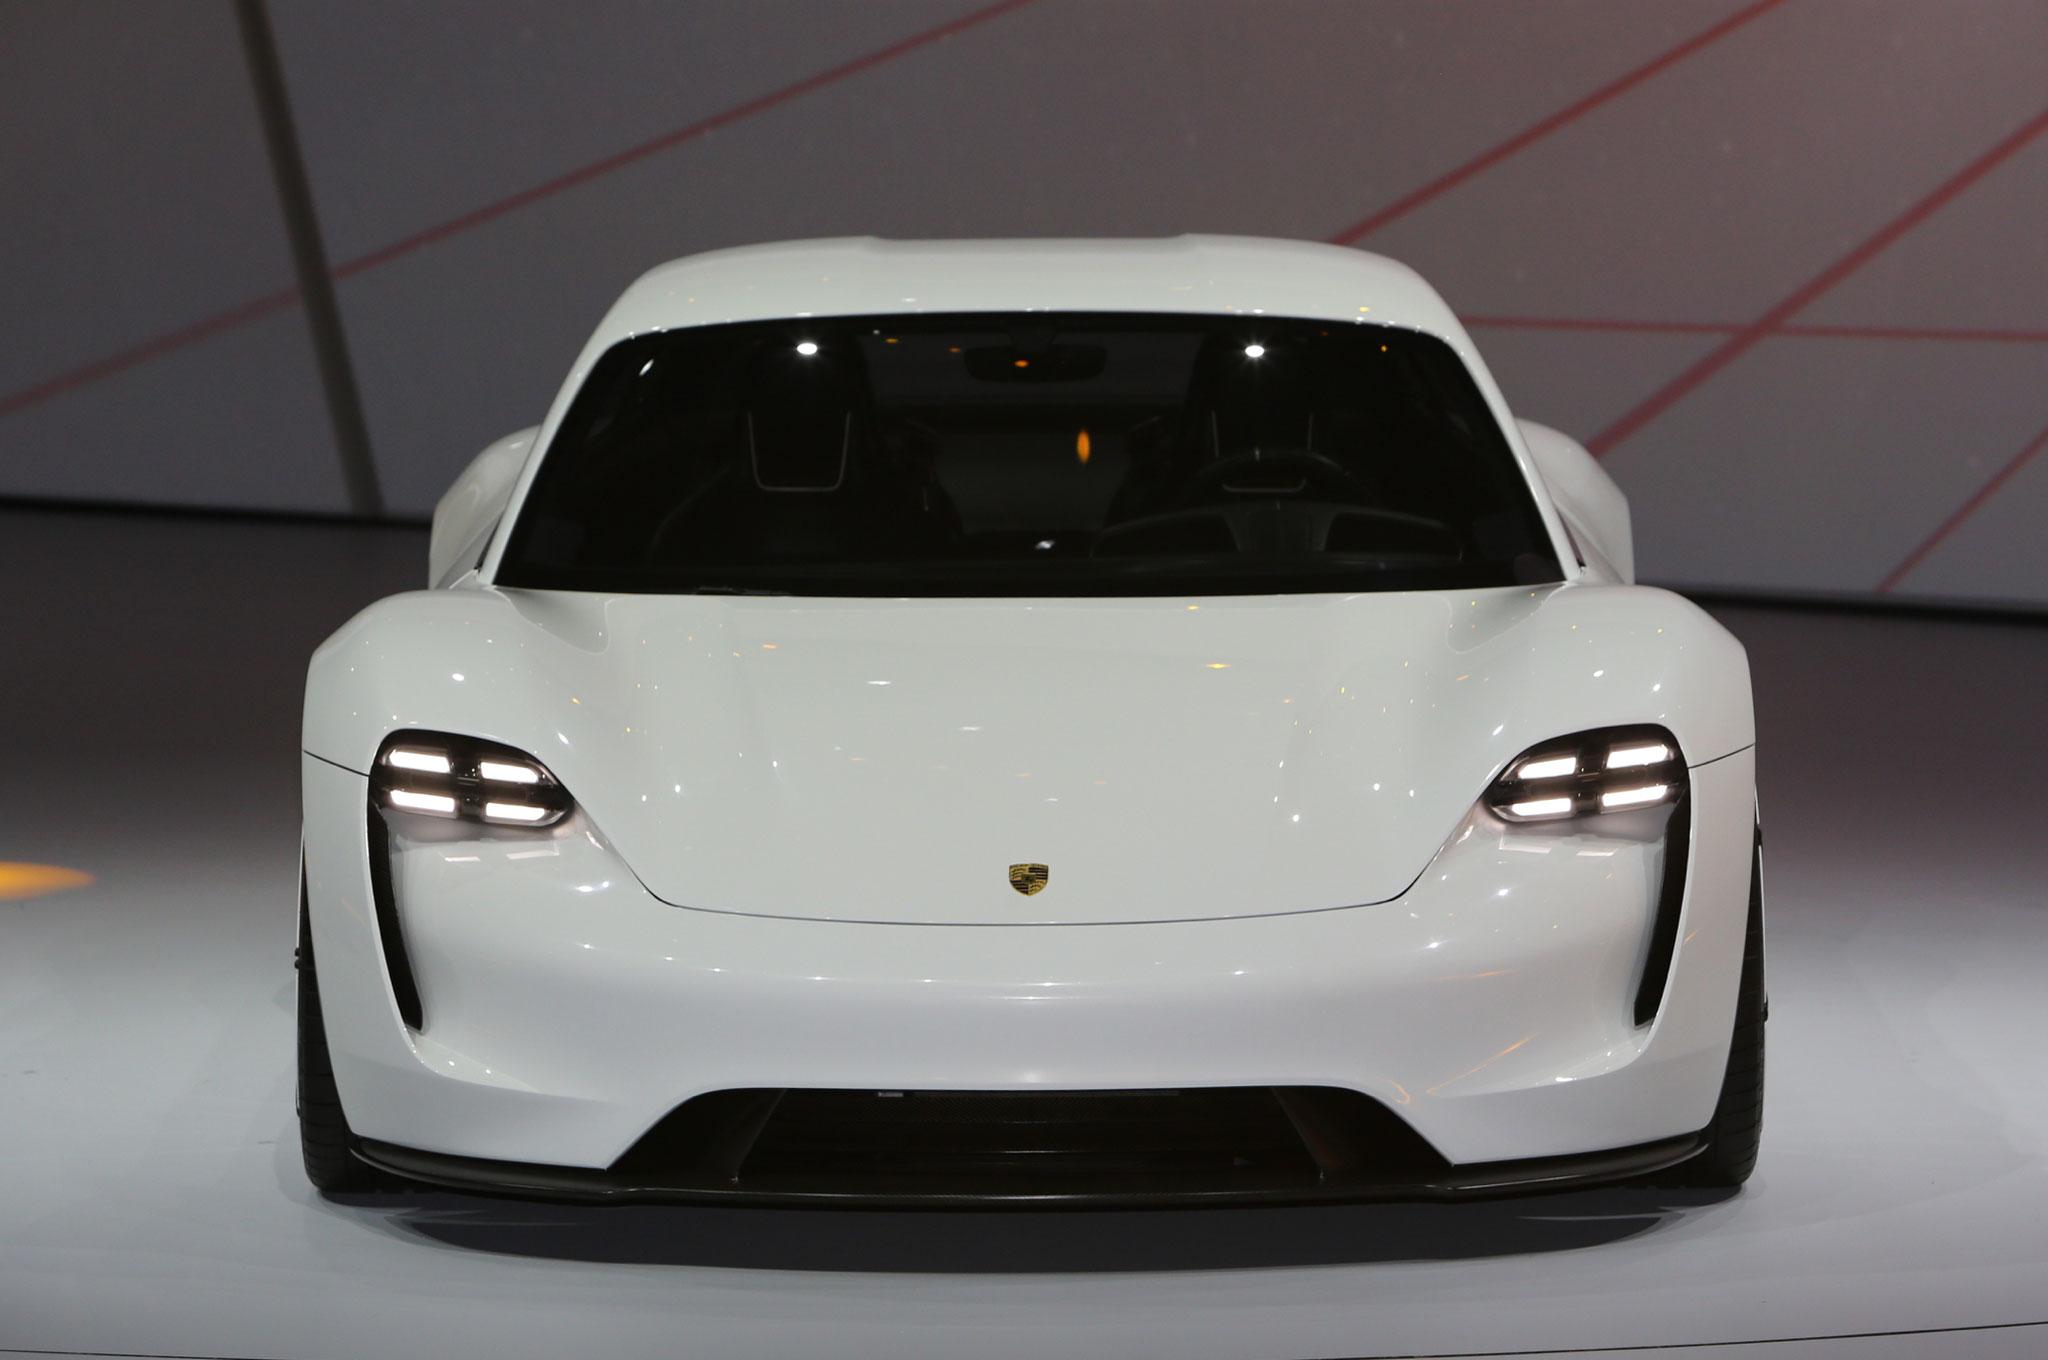 Porsche Mission E Concept Ev Arrives In Frankfurt With 600 Hp